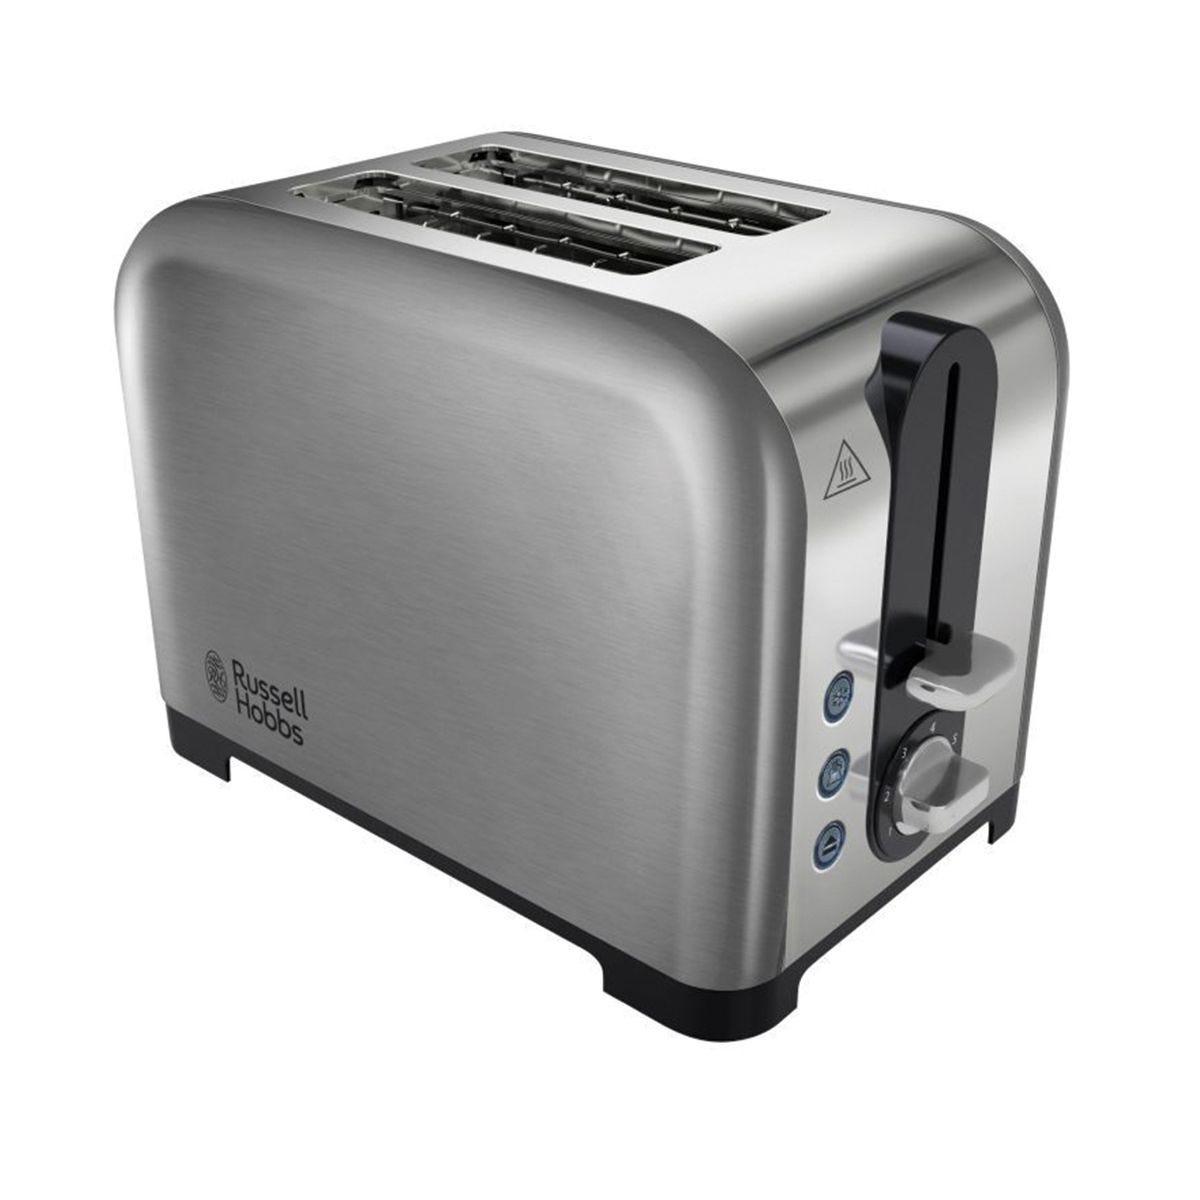 Russell Hobbs 2 Slice Toaster Brushed Stainless Steel, S/Steel